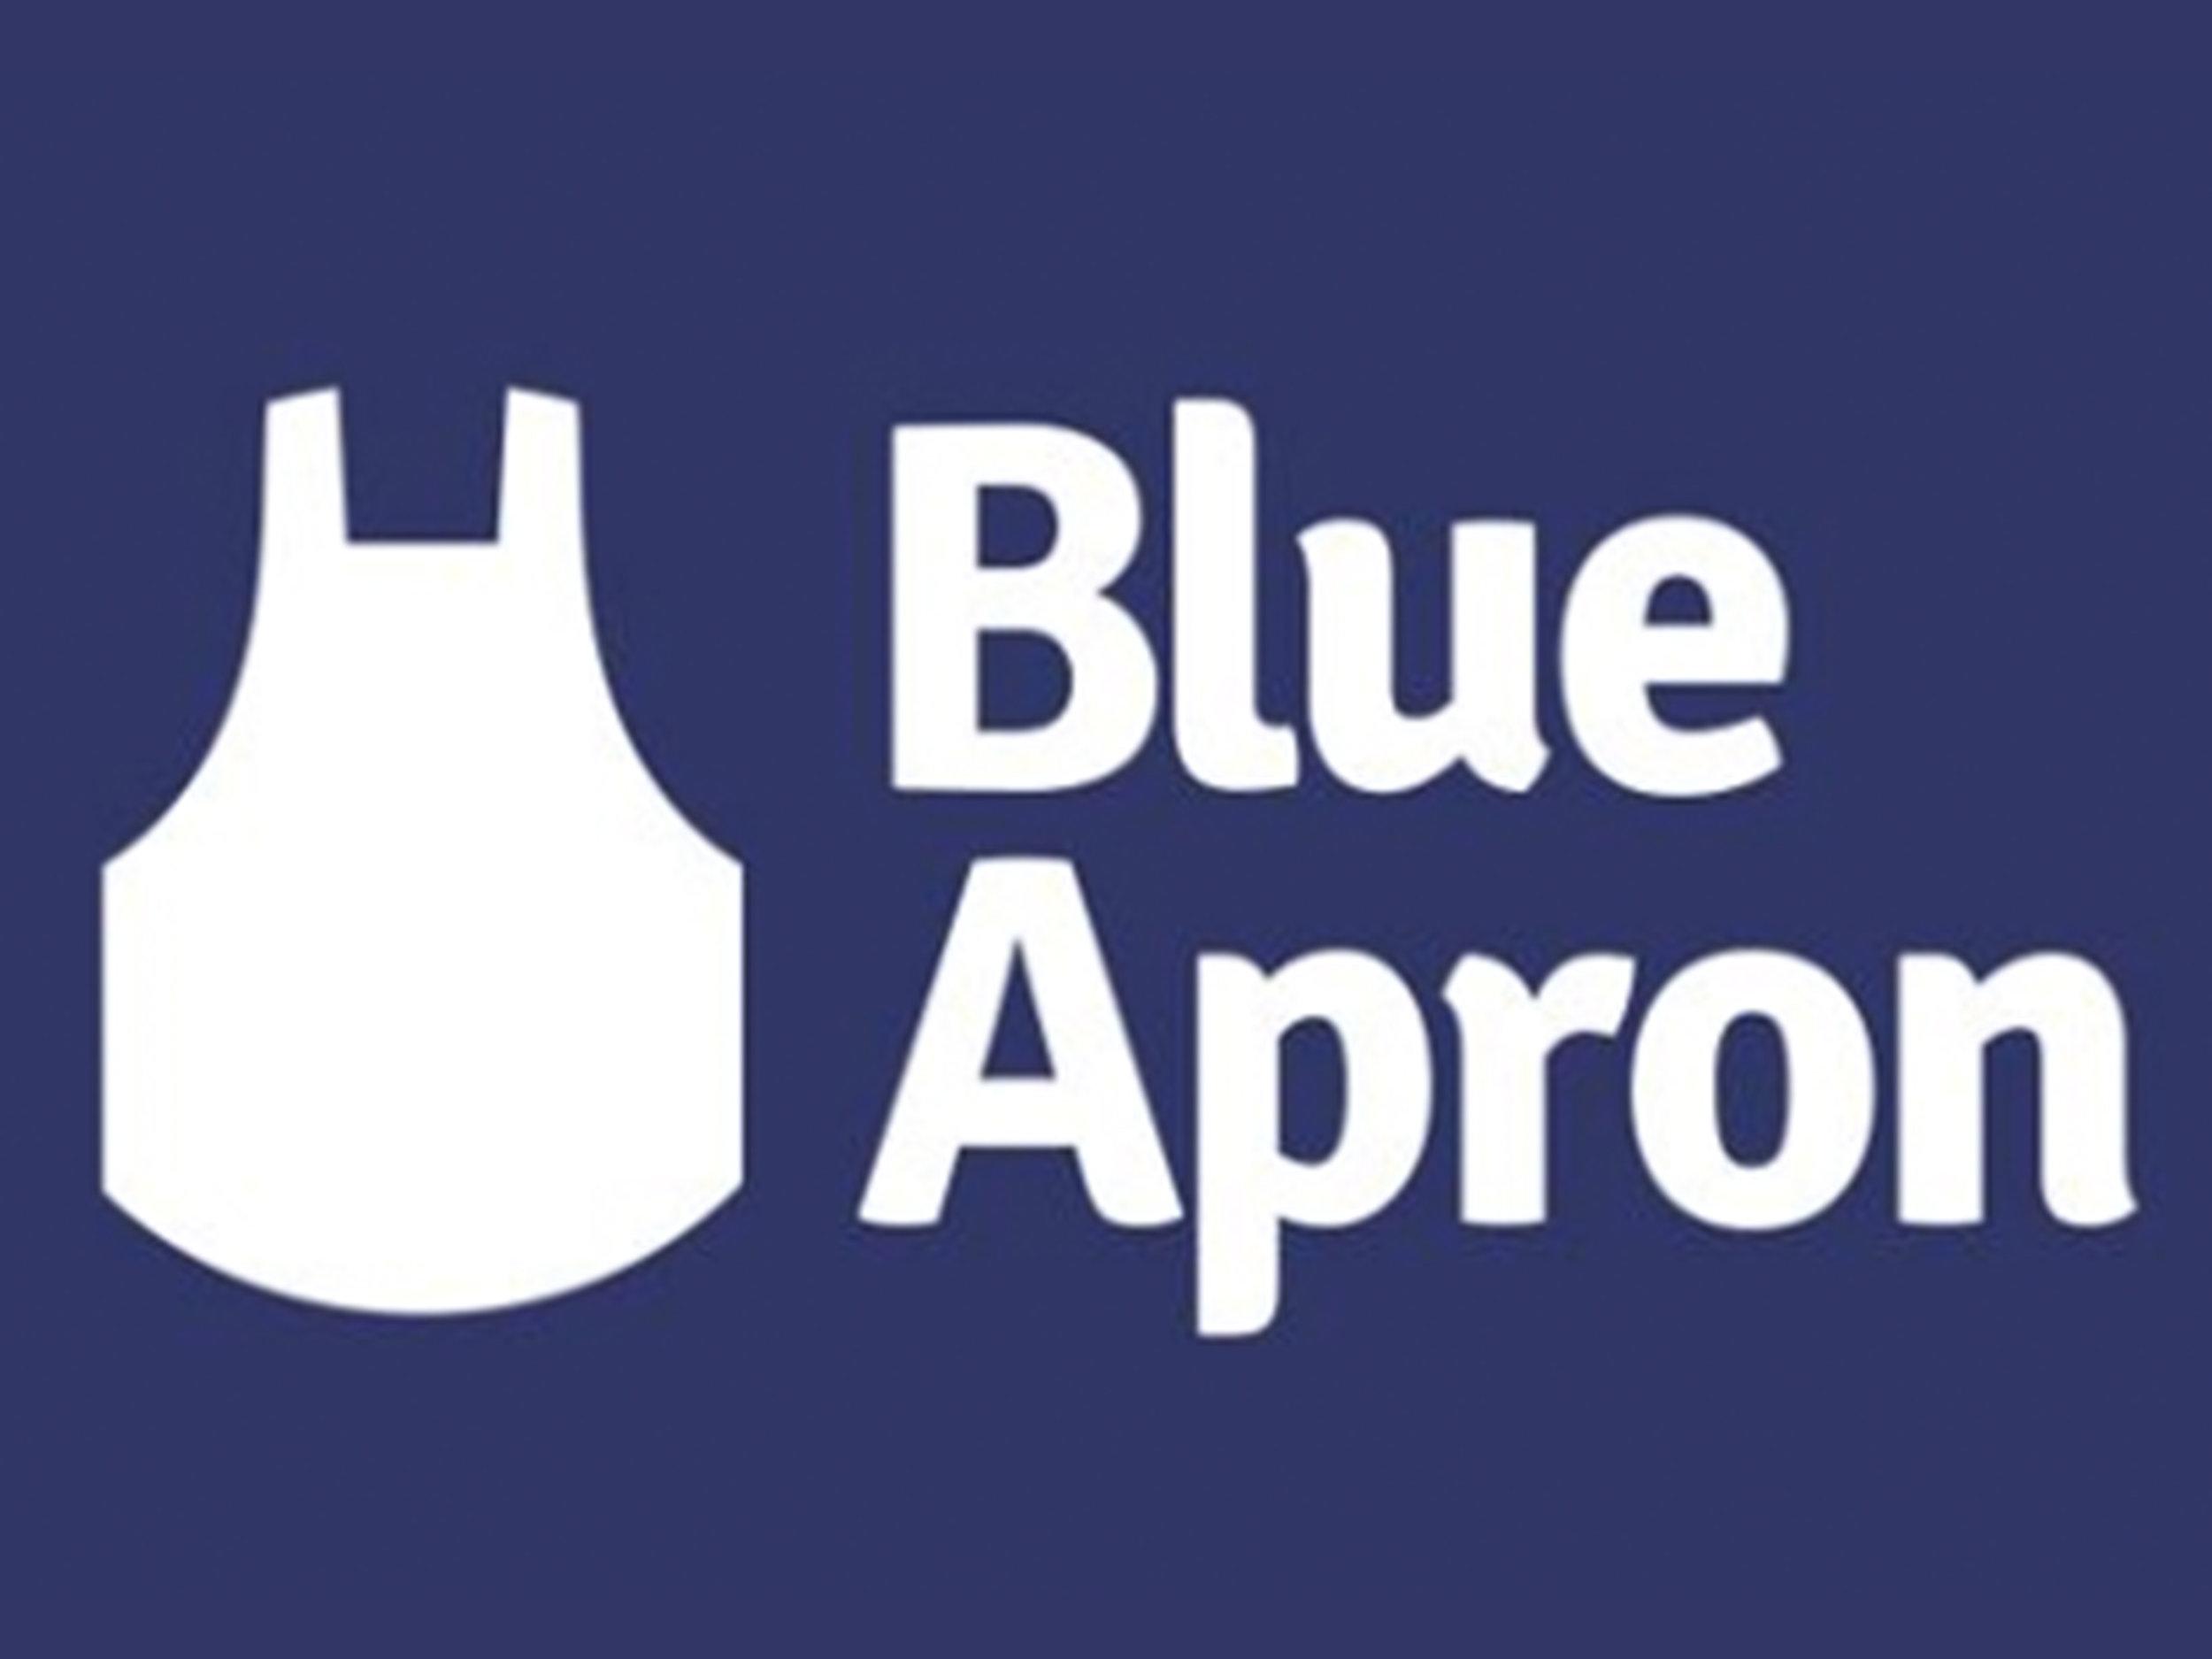 Blue Apron x Chrissy Teigan